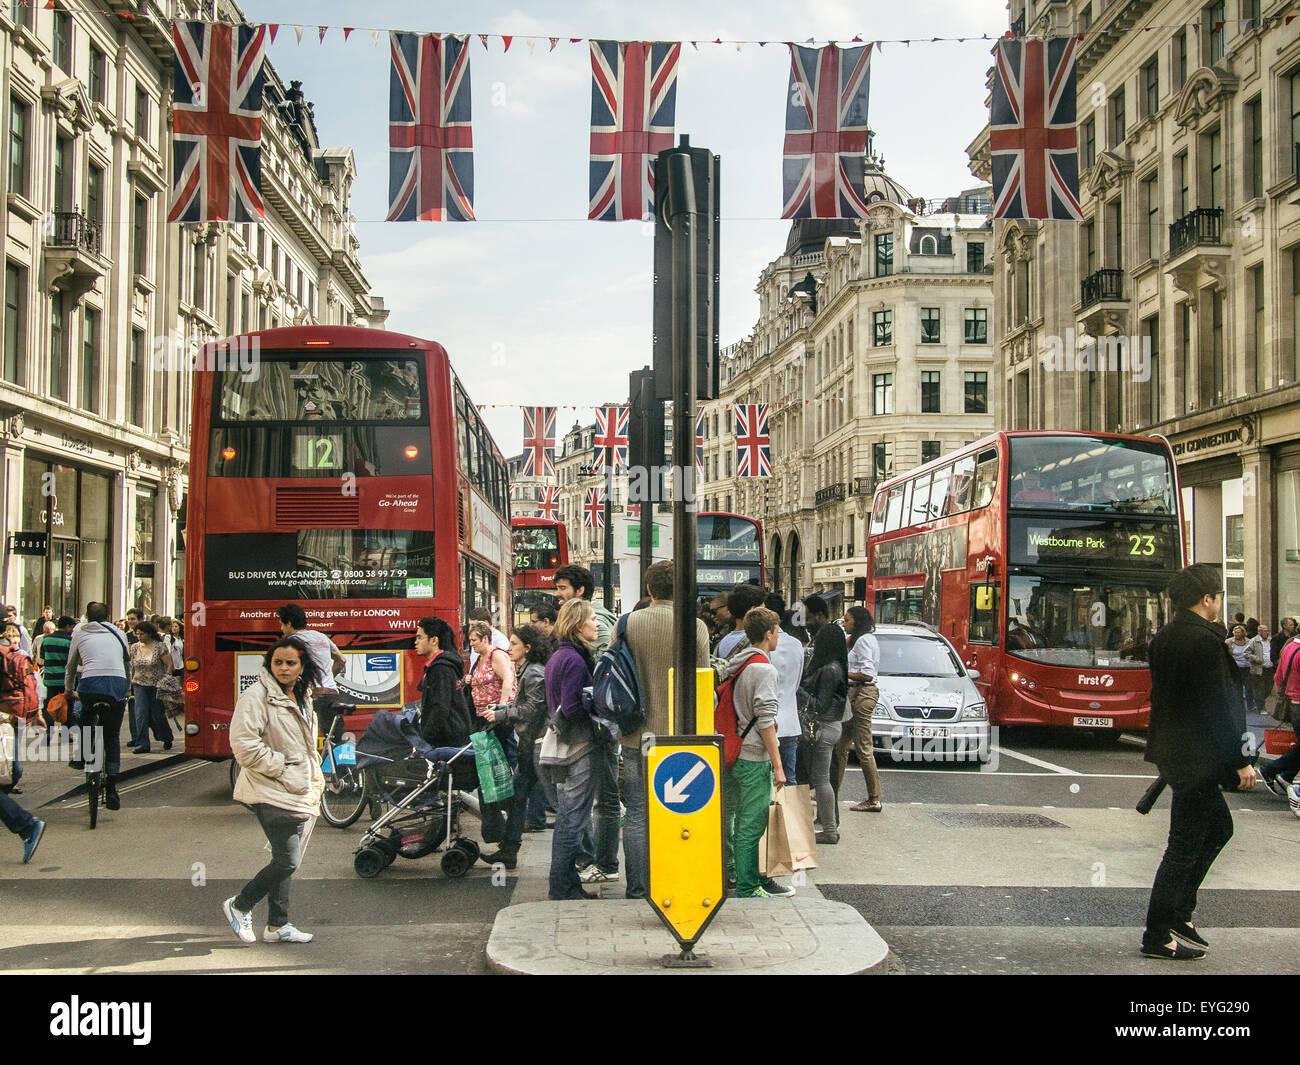 Oxford Street, London - Stock Image